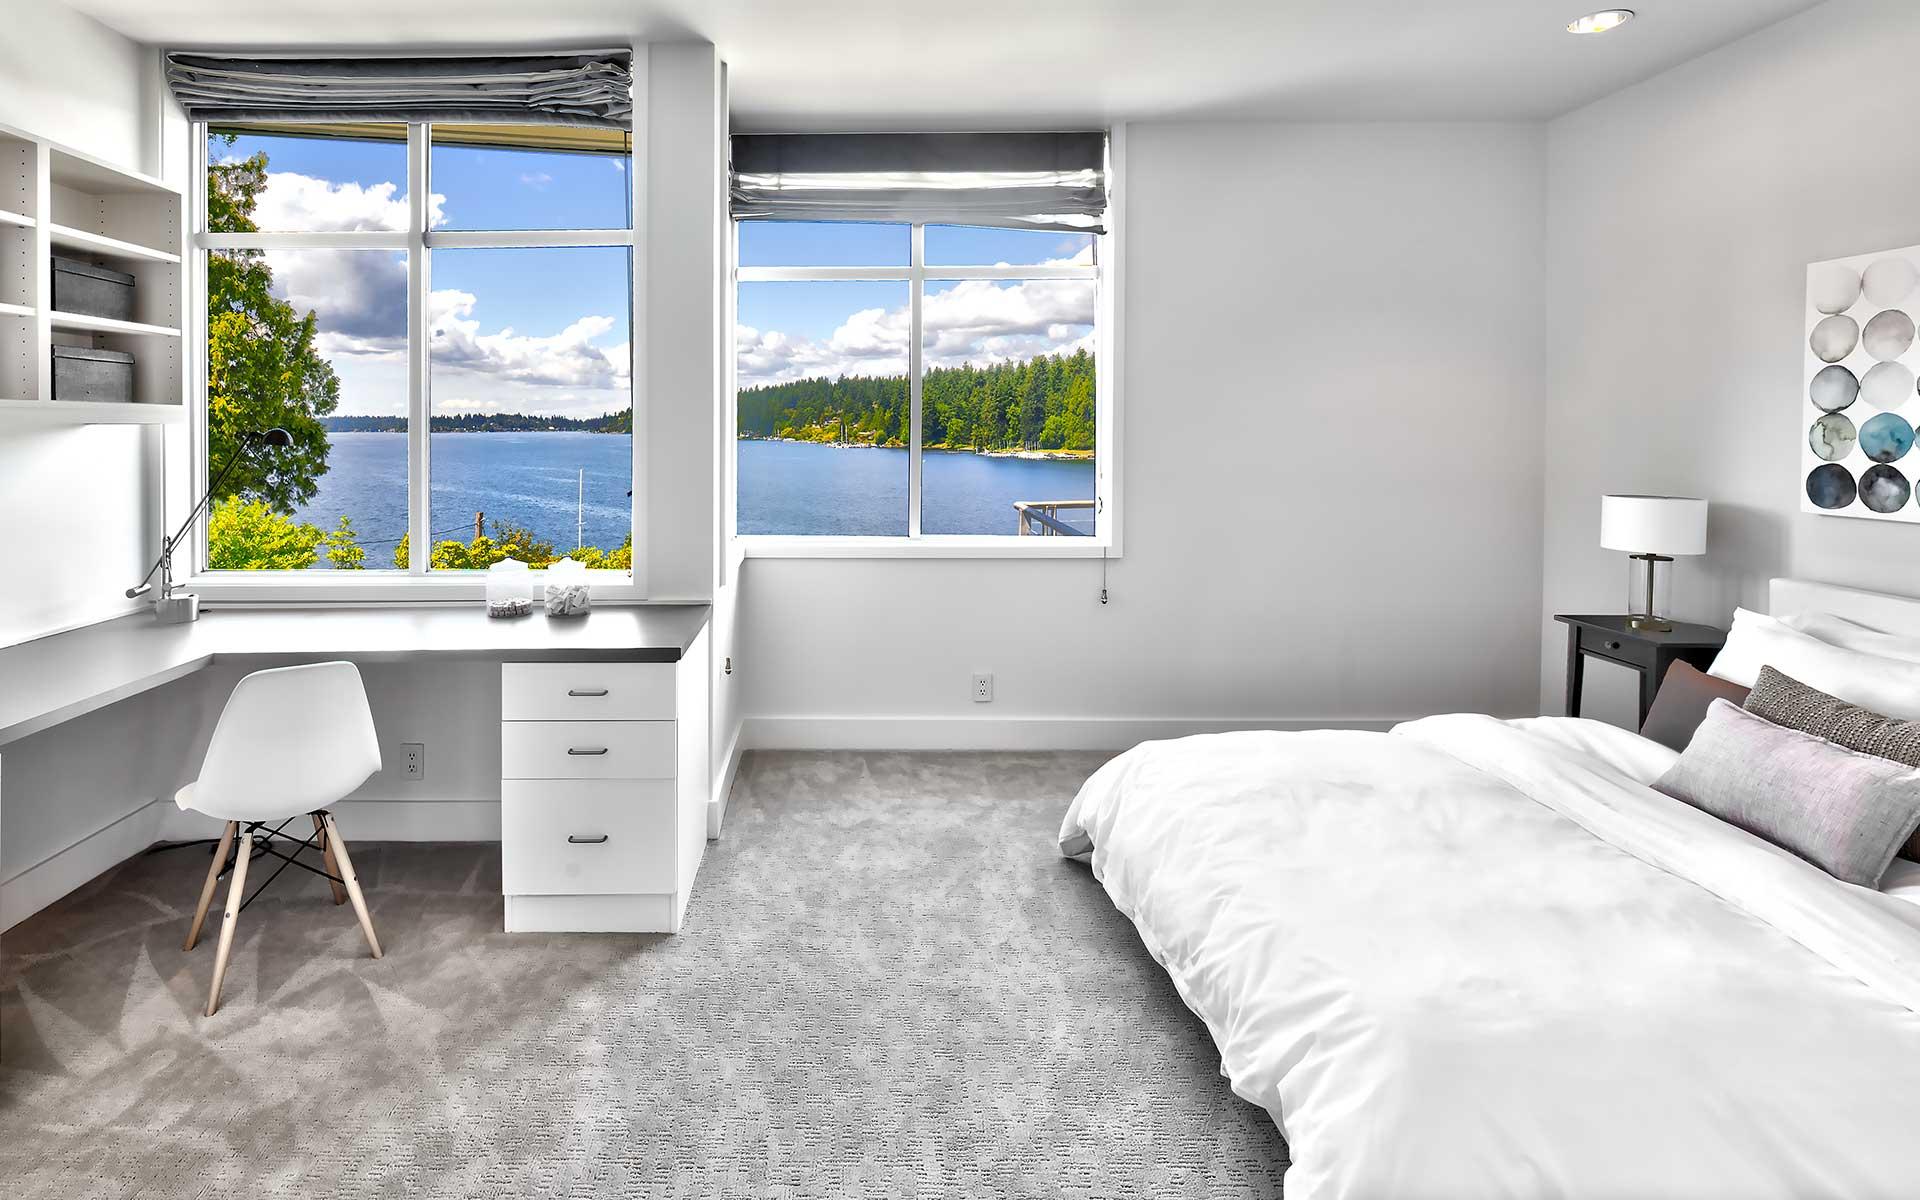 The Modern Lakehouse photo